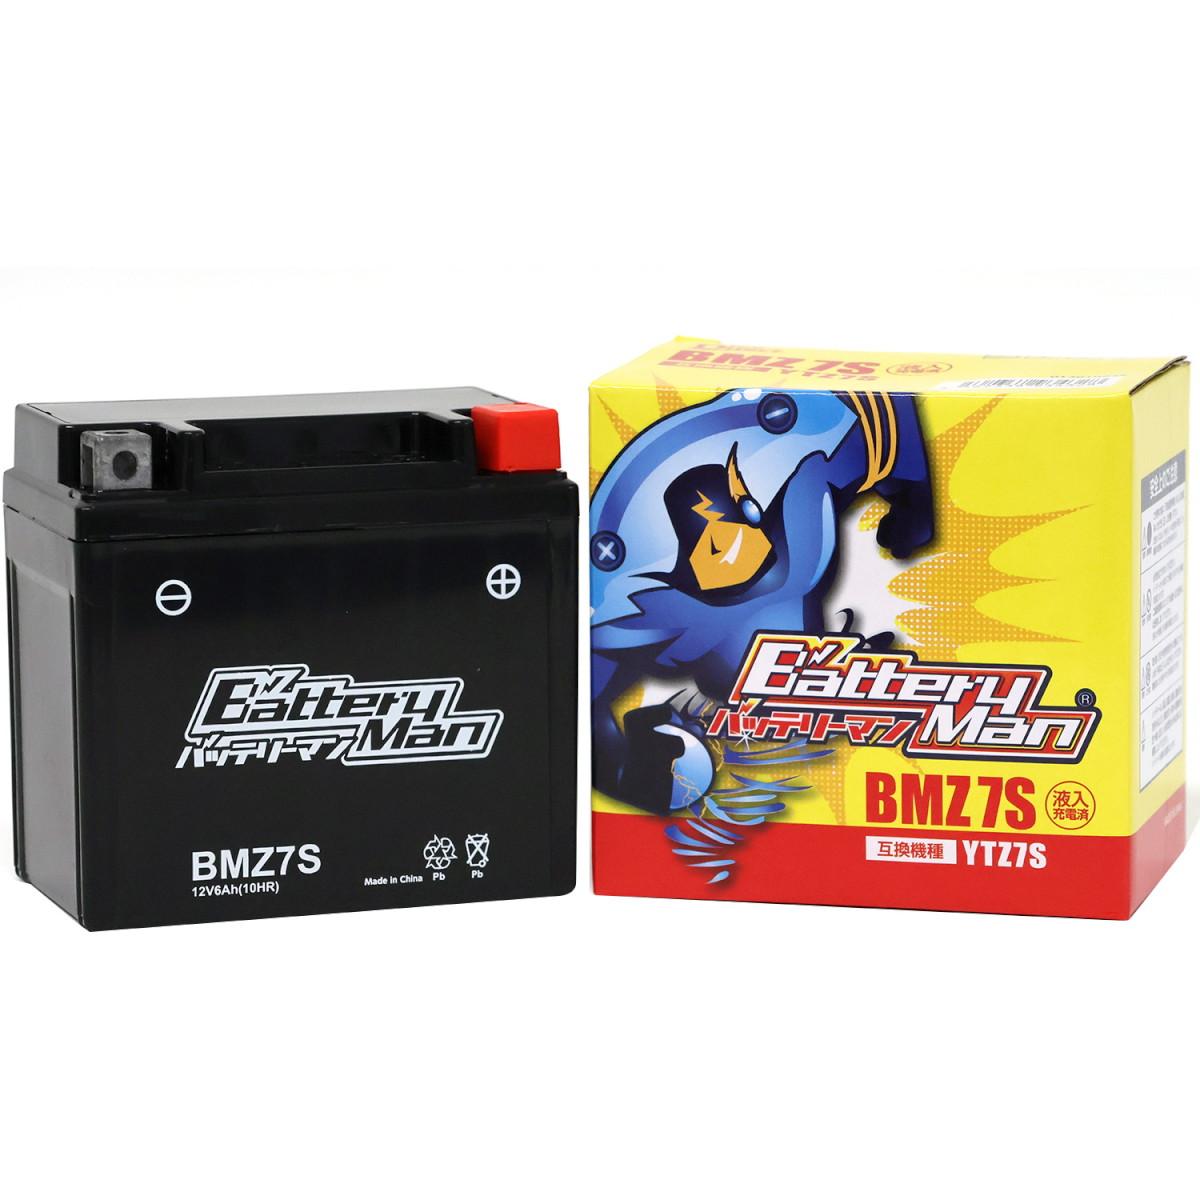 BMZ7S(YTZ7S 互換)(液入充電済)